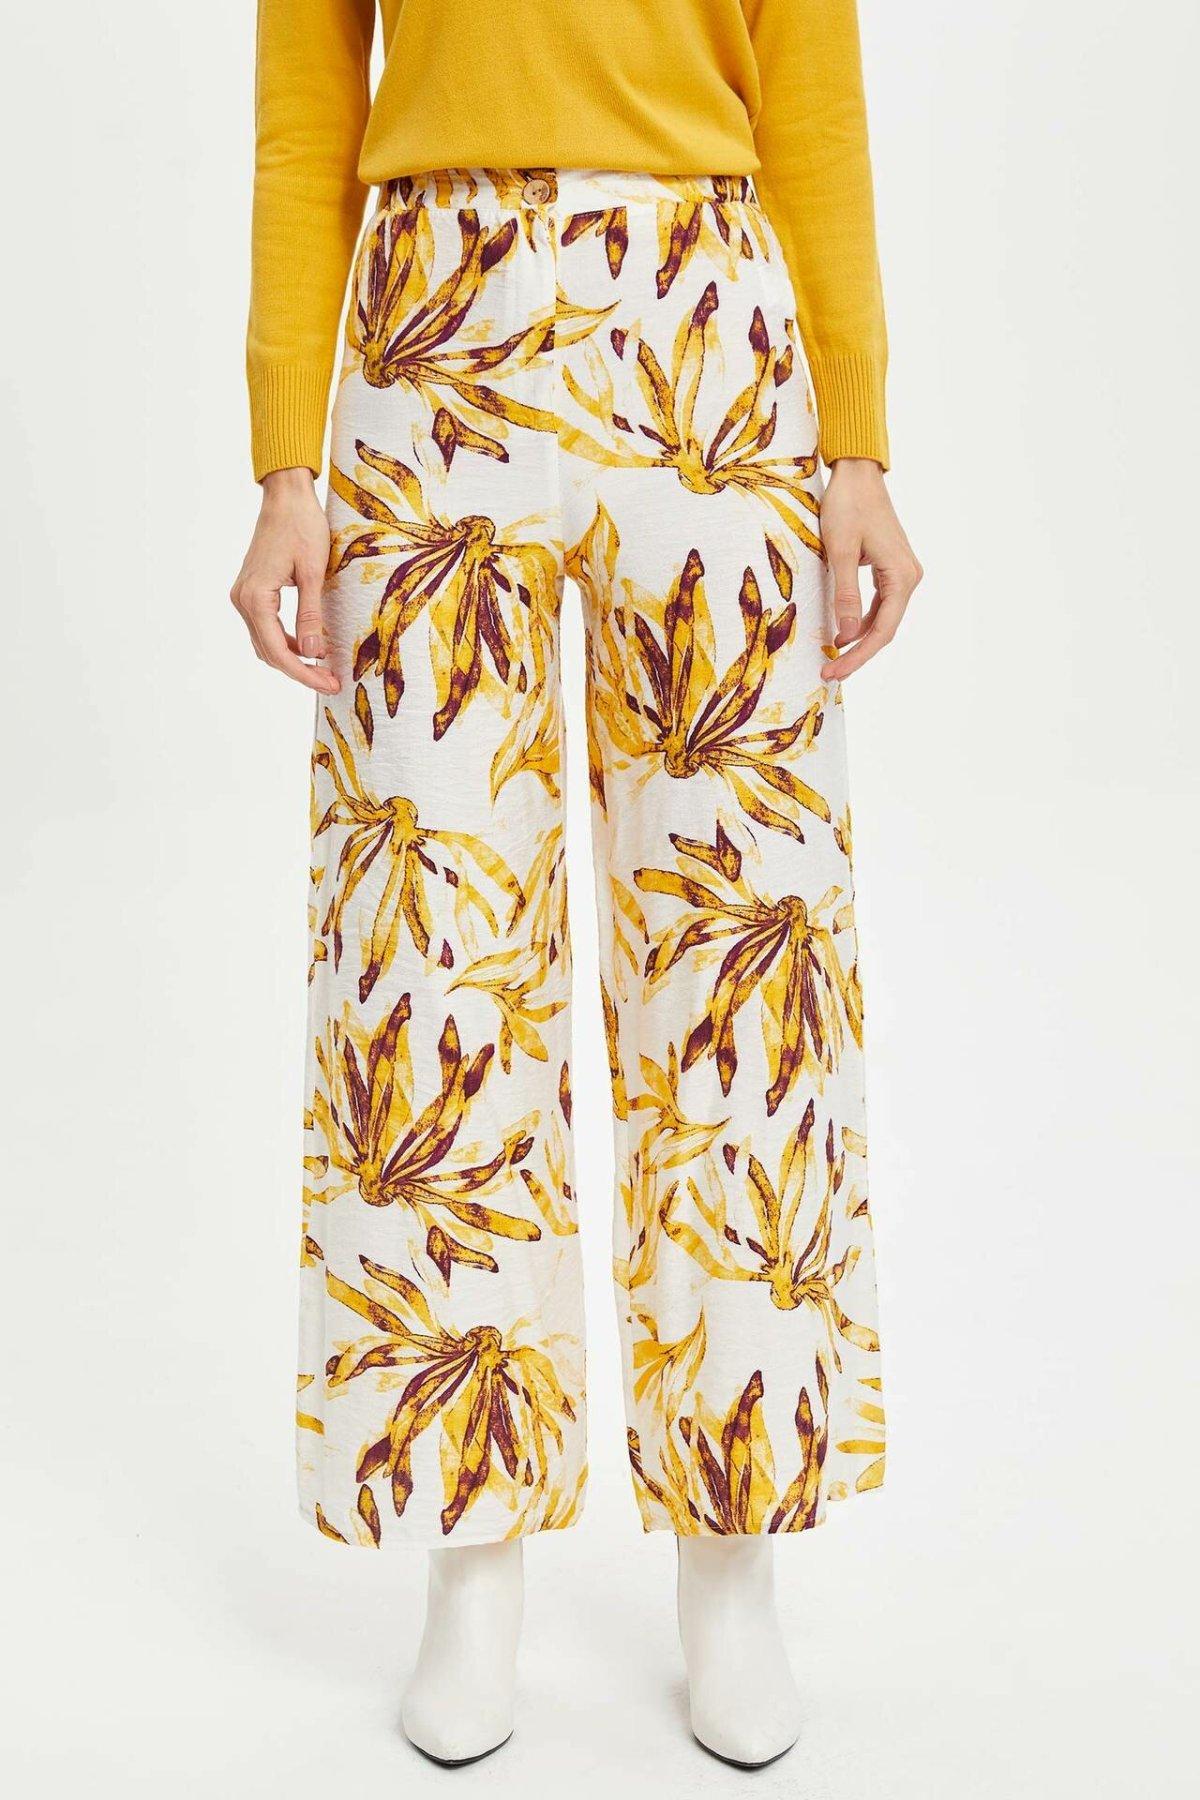 DeFacto Fashion Woman Print Pattern Trousers Female Casual Loose Straight Long Pants Ladies Comfort Simple Bottoms - M3938AZ19AU